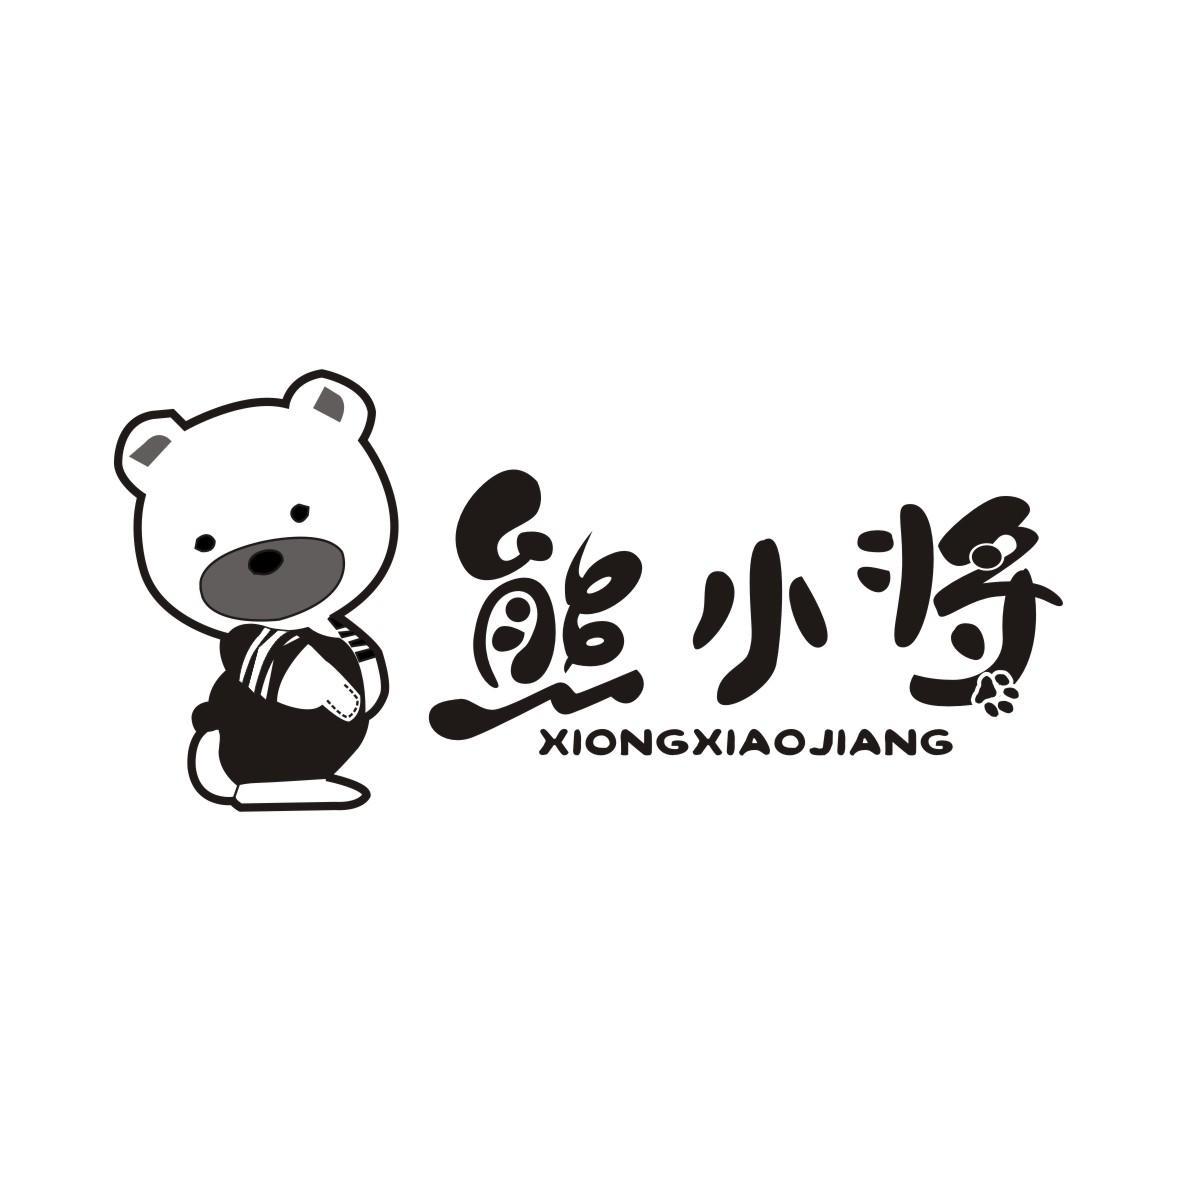 熊小将XIONGXIAOJIANG+图形